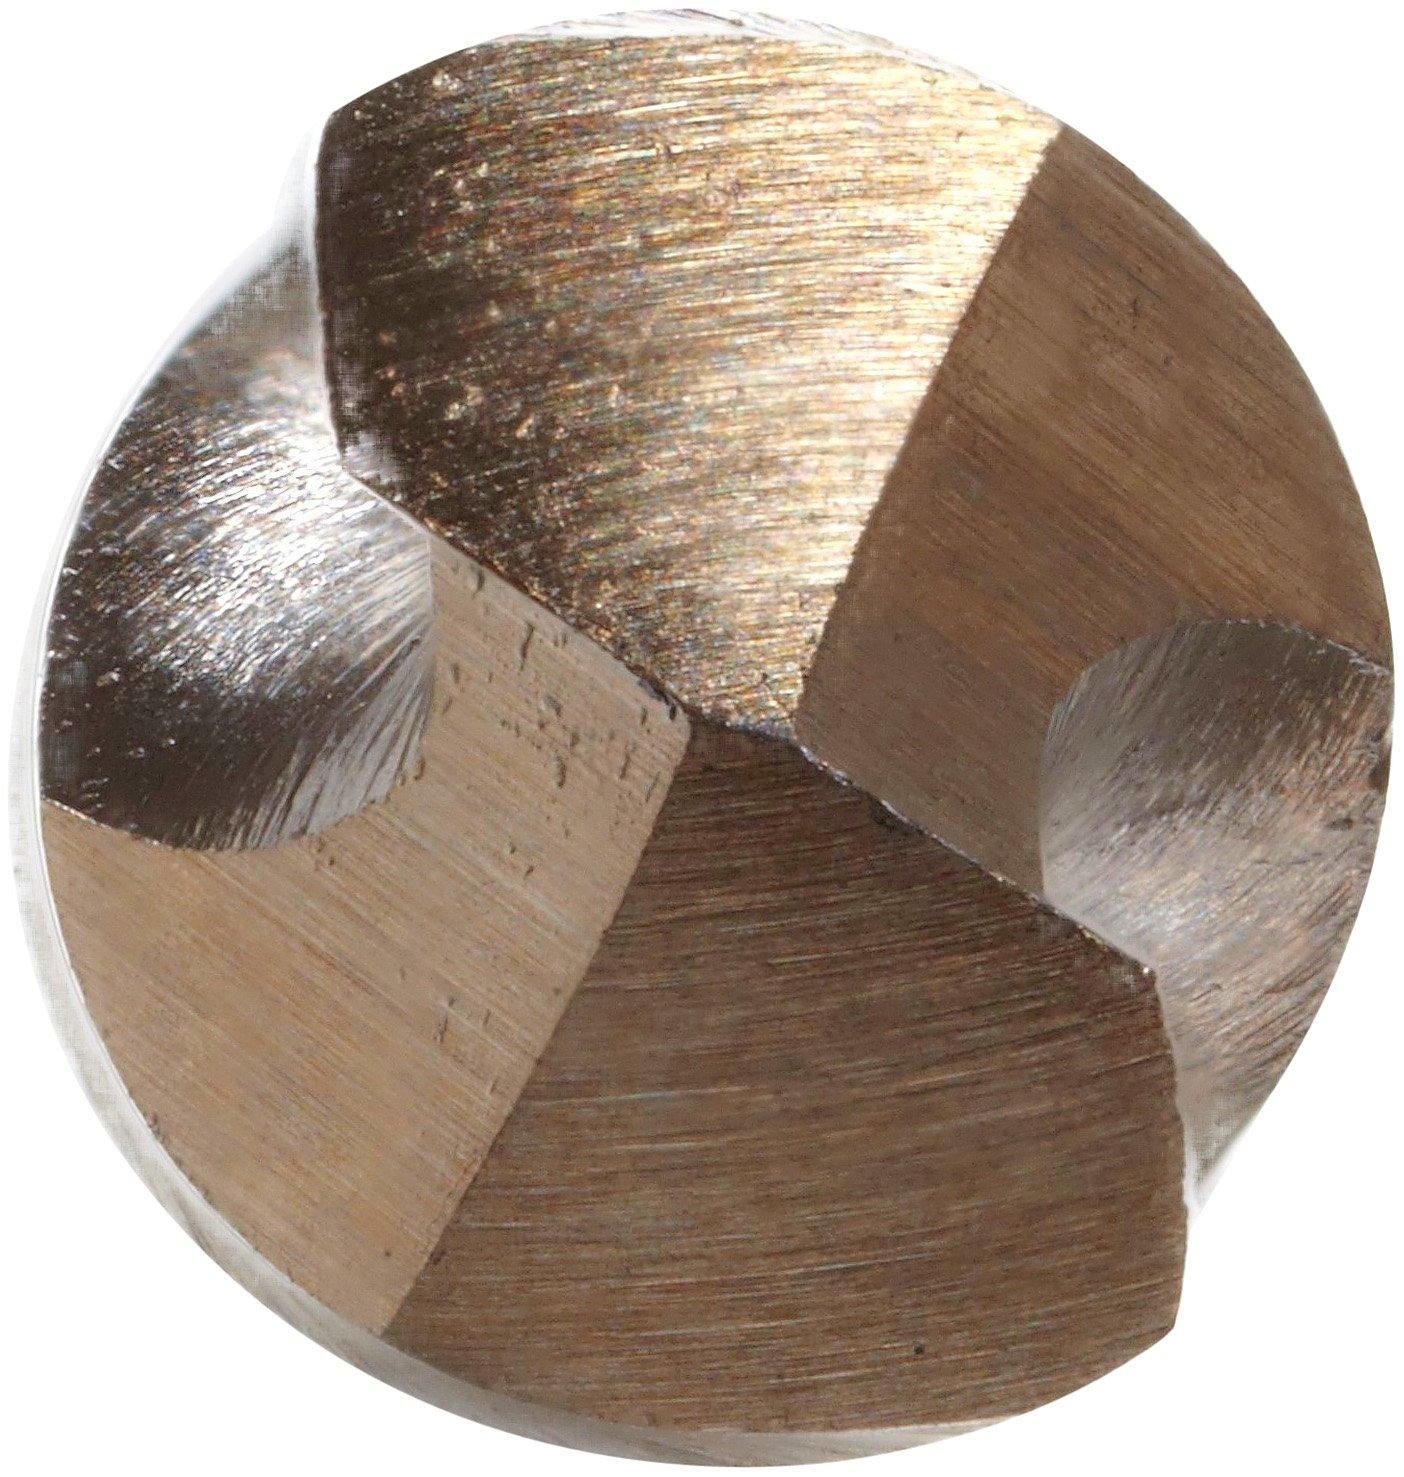 13//64 Pack of 12 Round Shank 135 Degree Point Angle 13//64 Spiral Flute Pack of 12 Bronze Oxide Finish Precision Twist R10CO Cobalt Steel Jobber Drill Bit Precision Dormer 010313